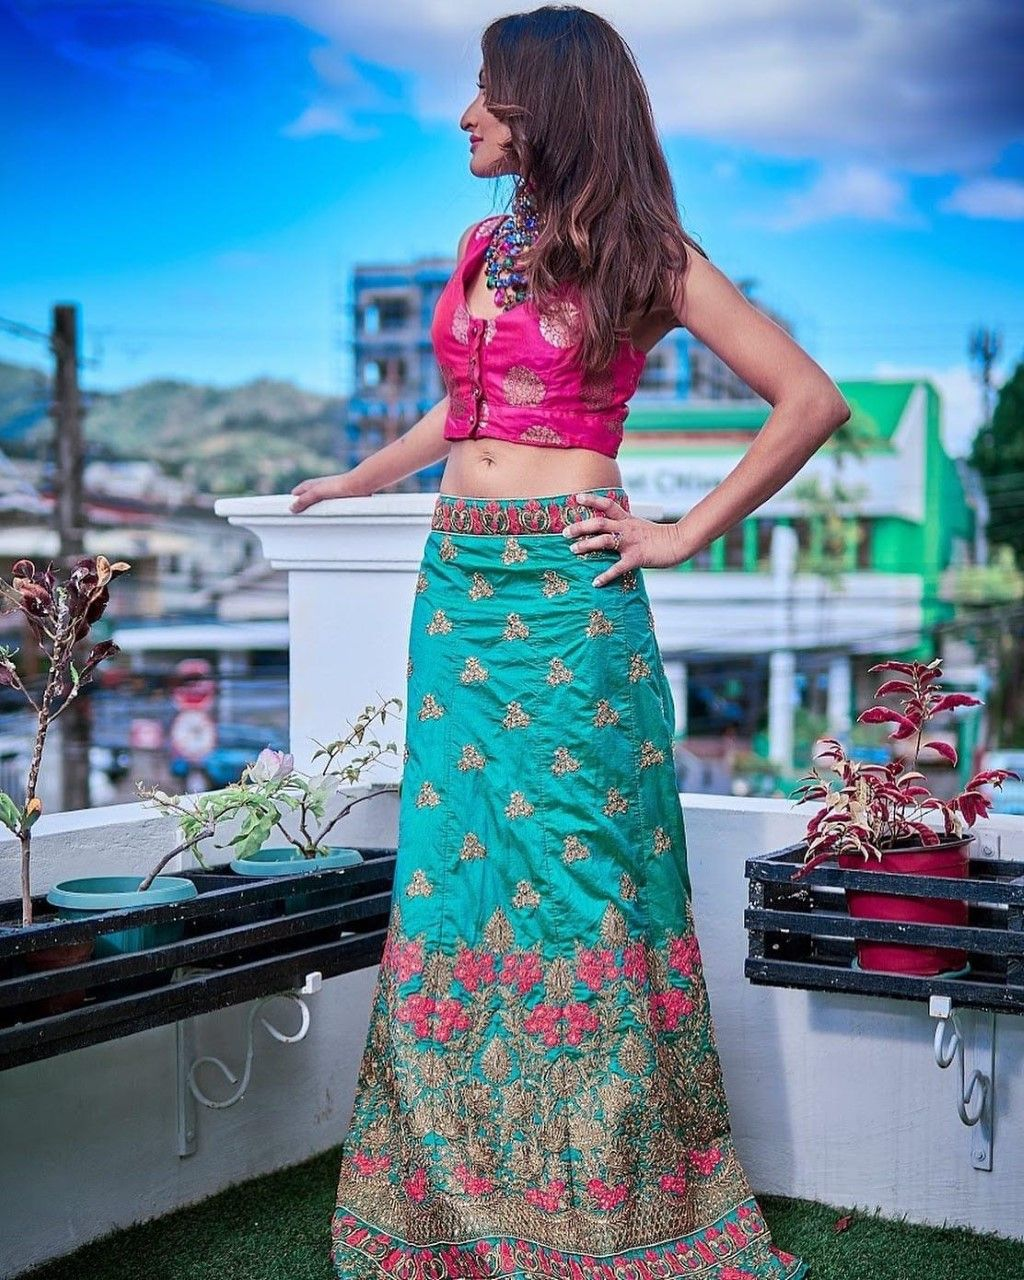 L'un des modèles d'inspiration indo de Neha Karina.